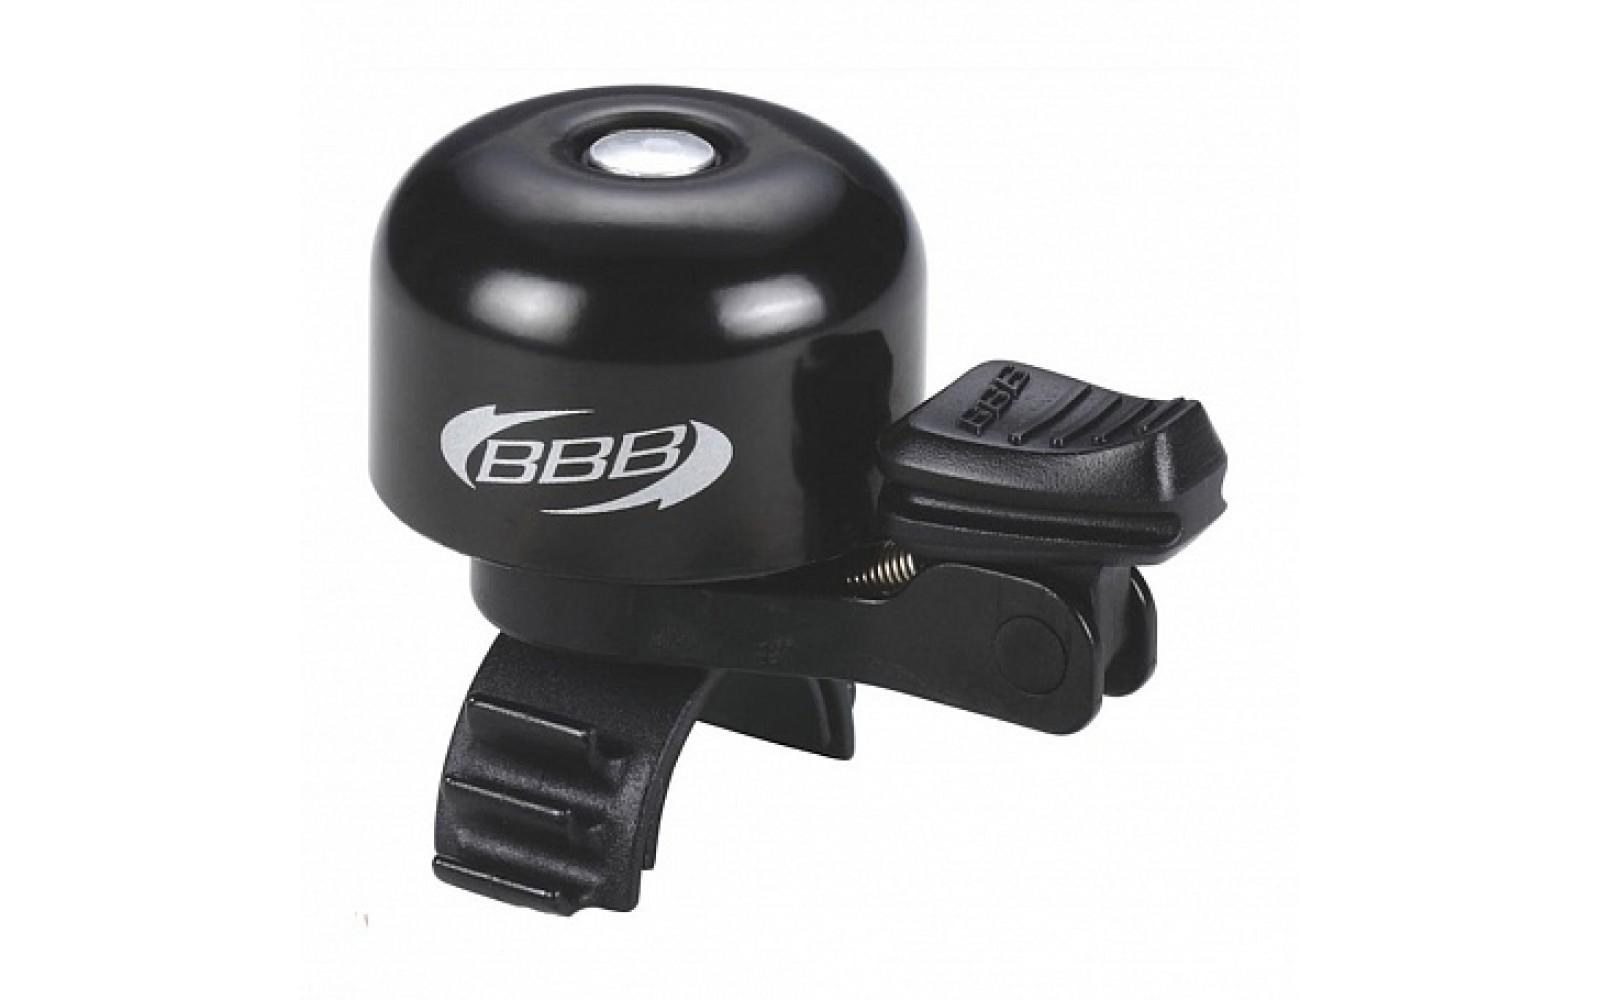 Звонок BBB Loud and Clear Deluxe черный